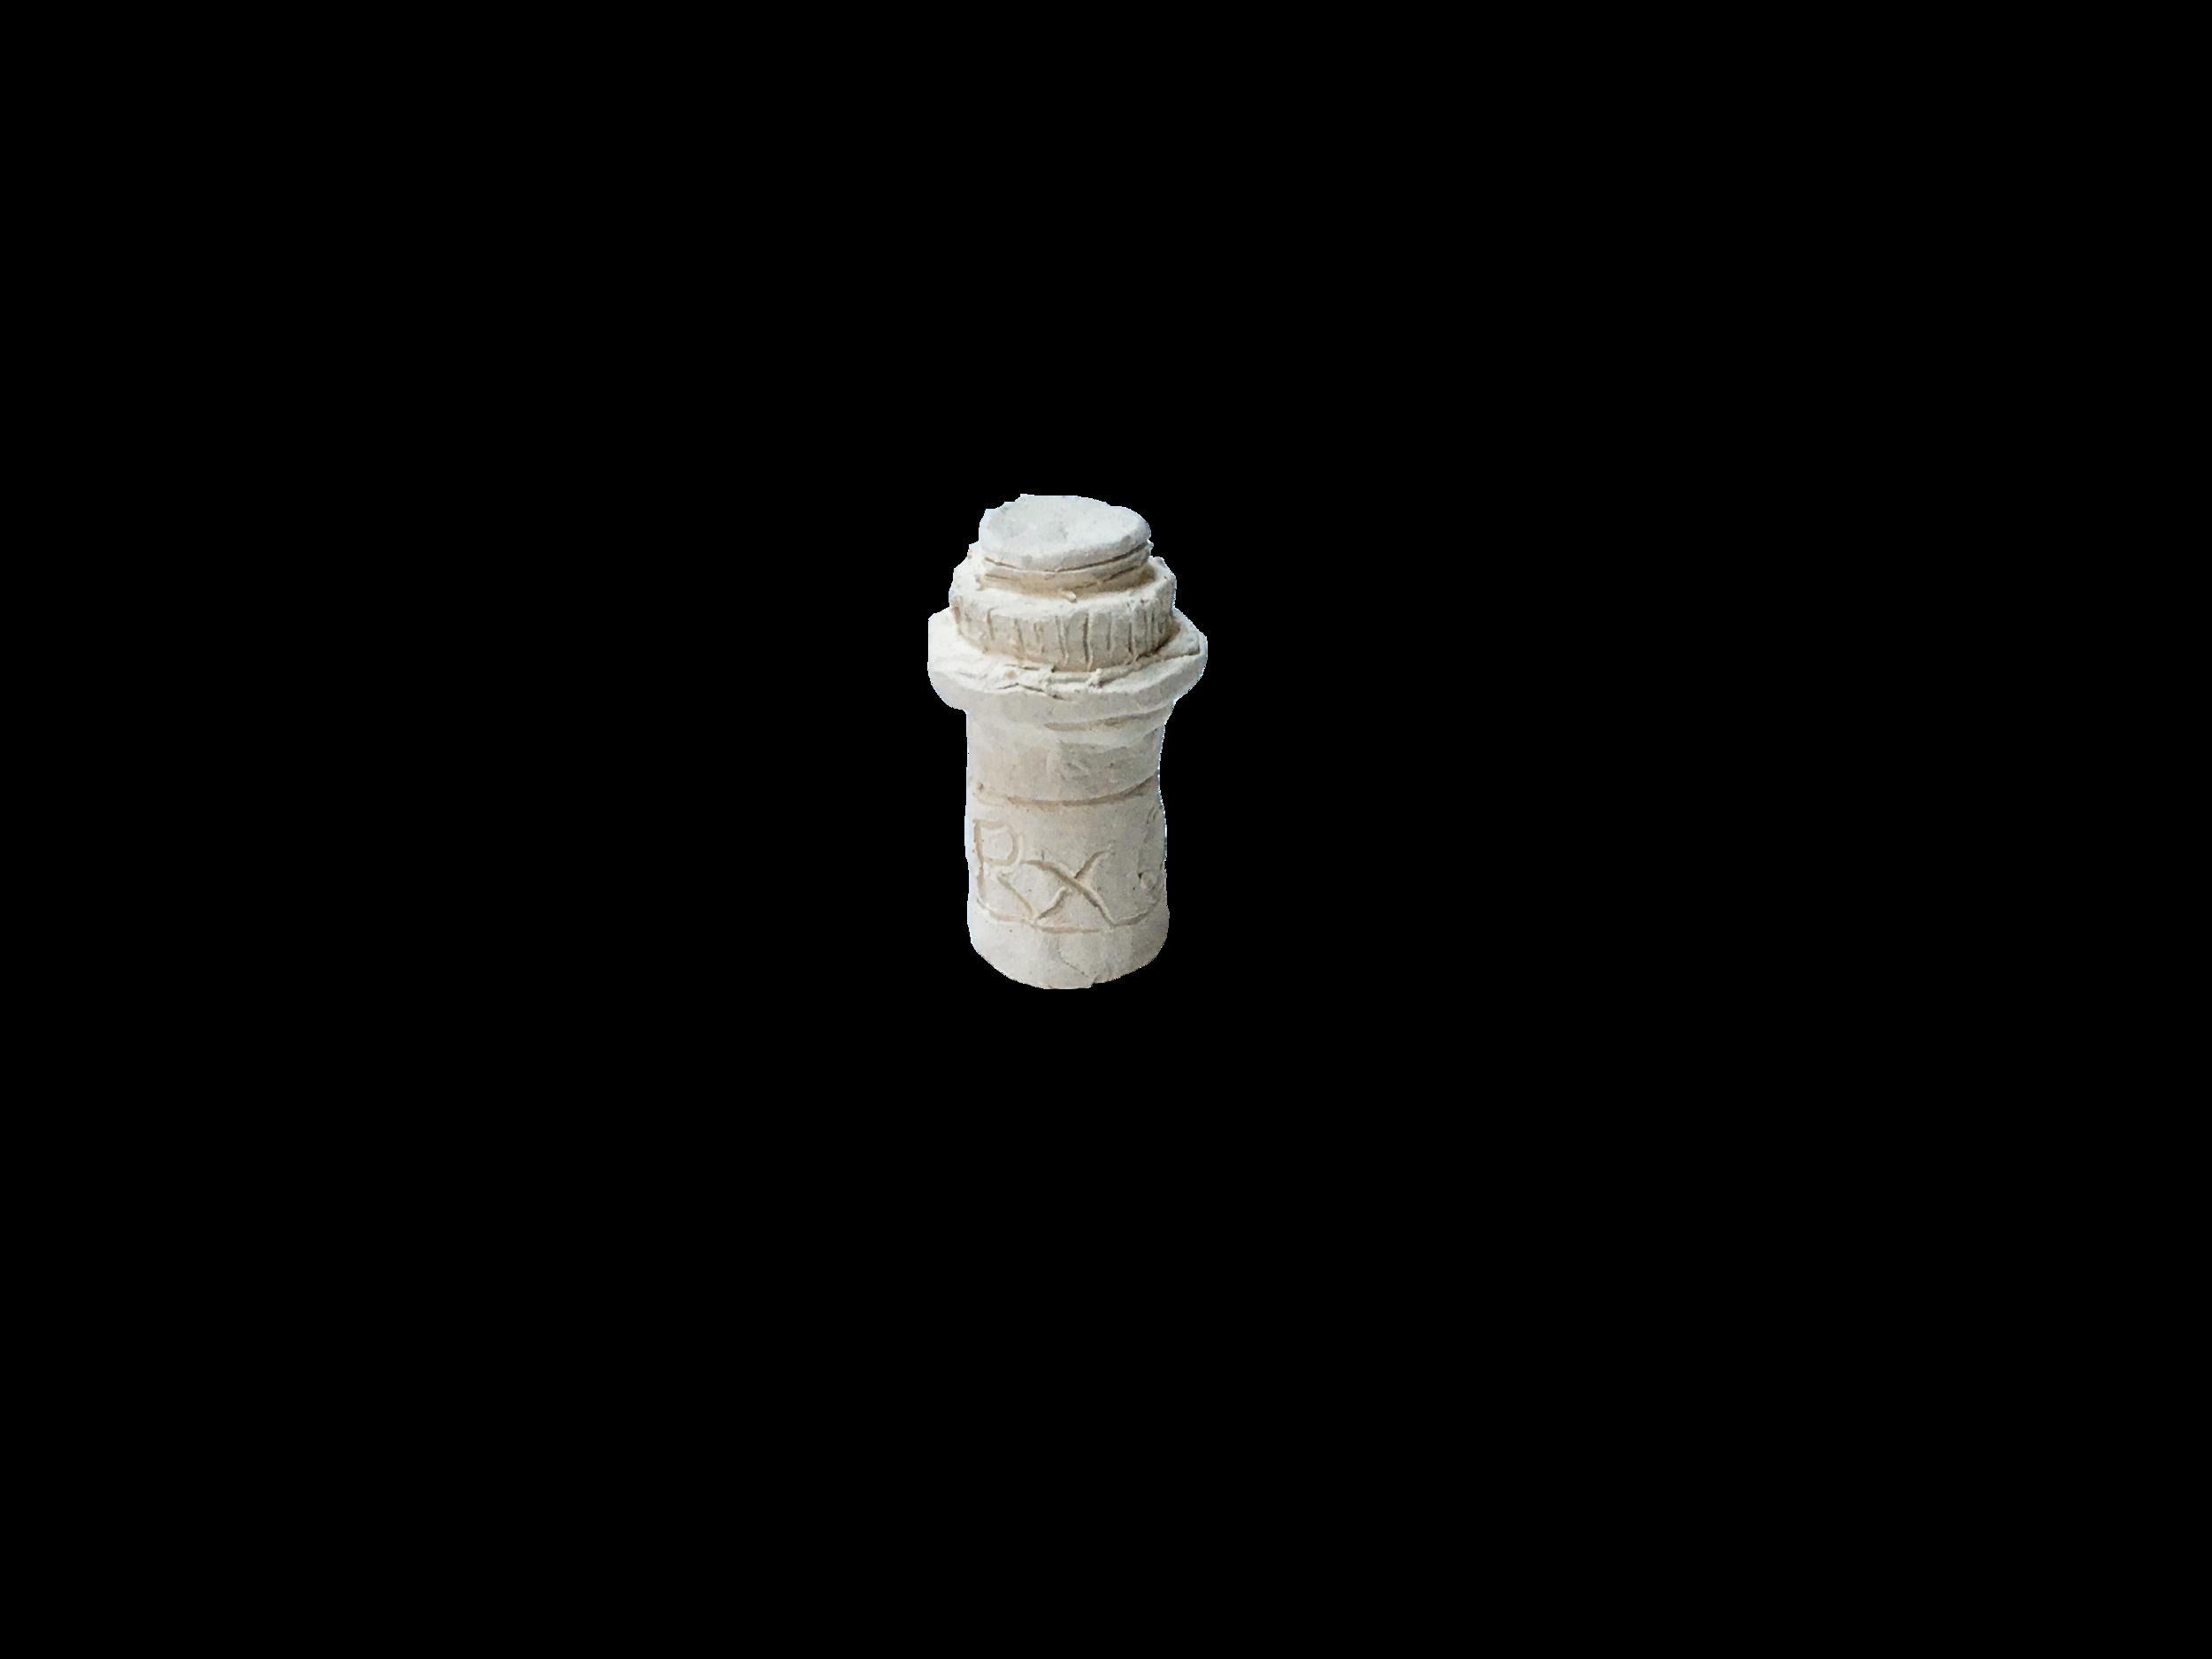 pill bottle_Forward Union_12_2_17.png